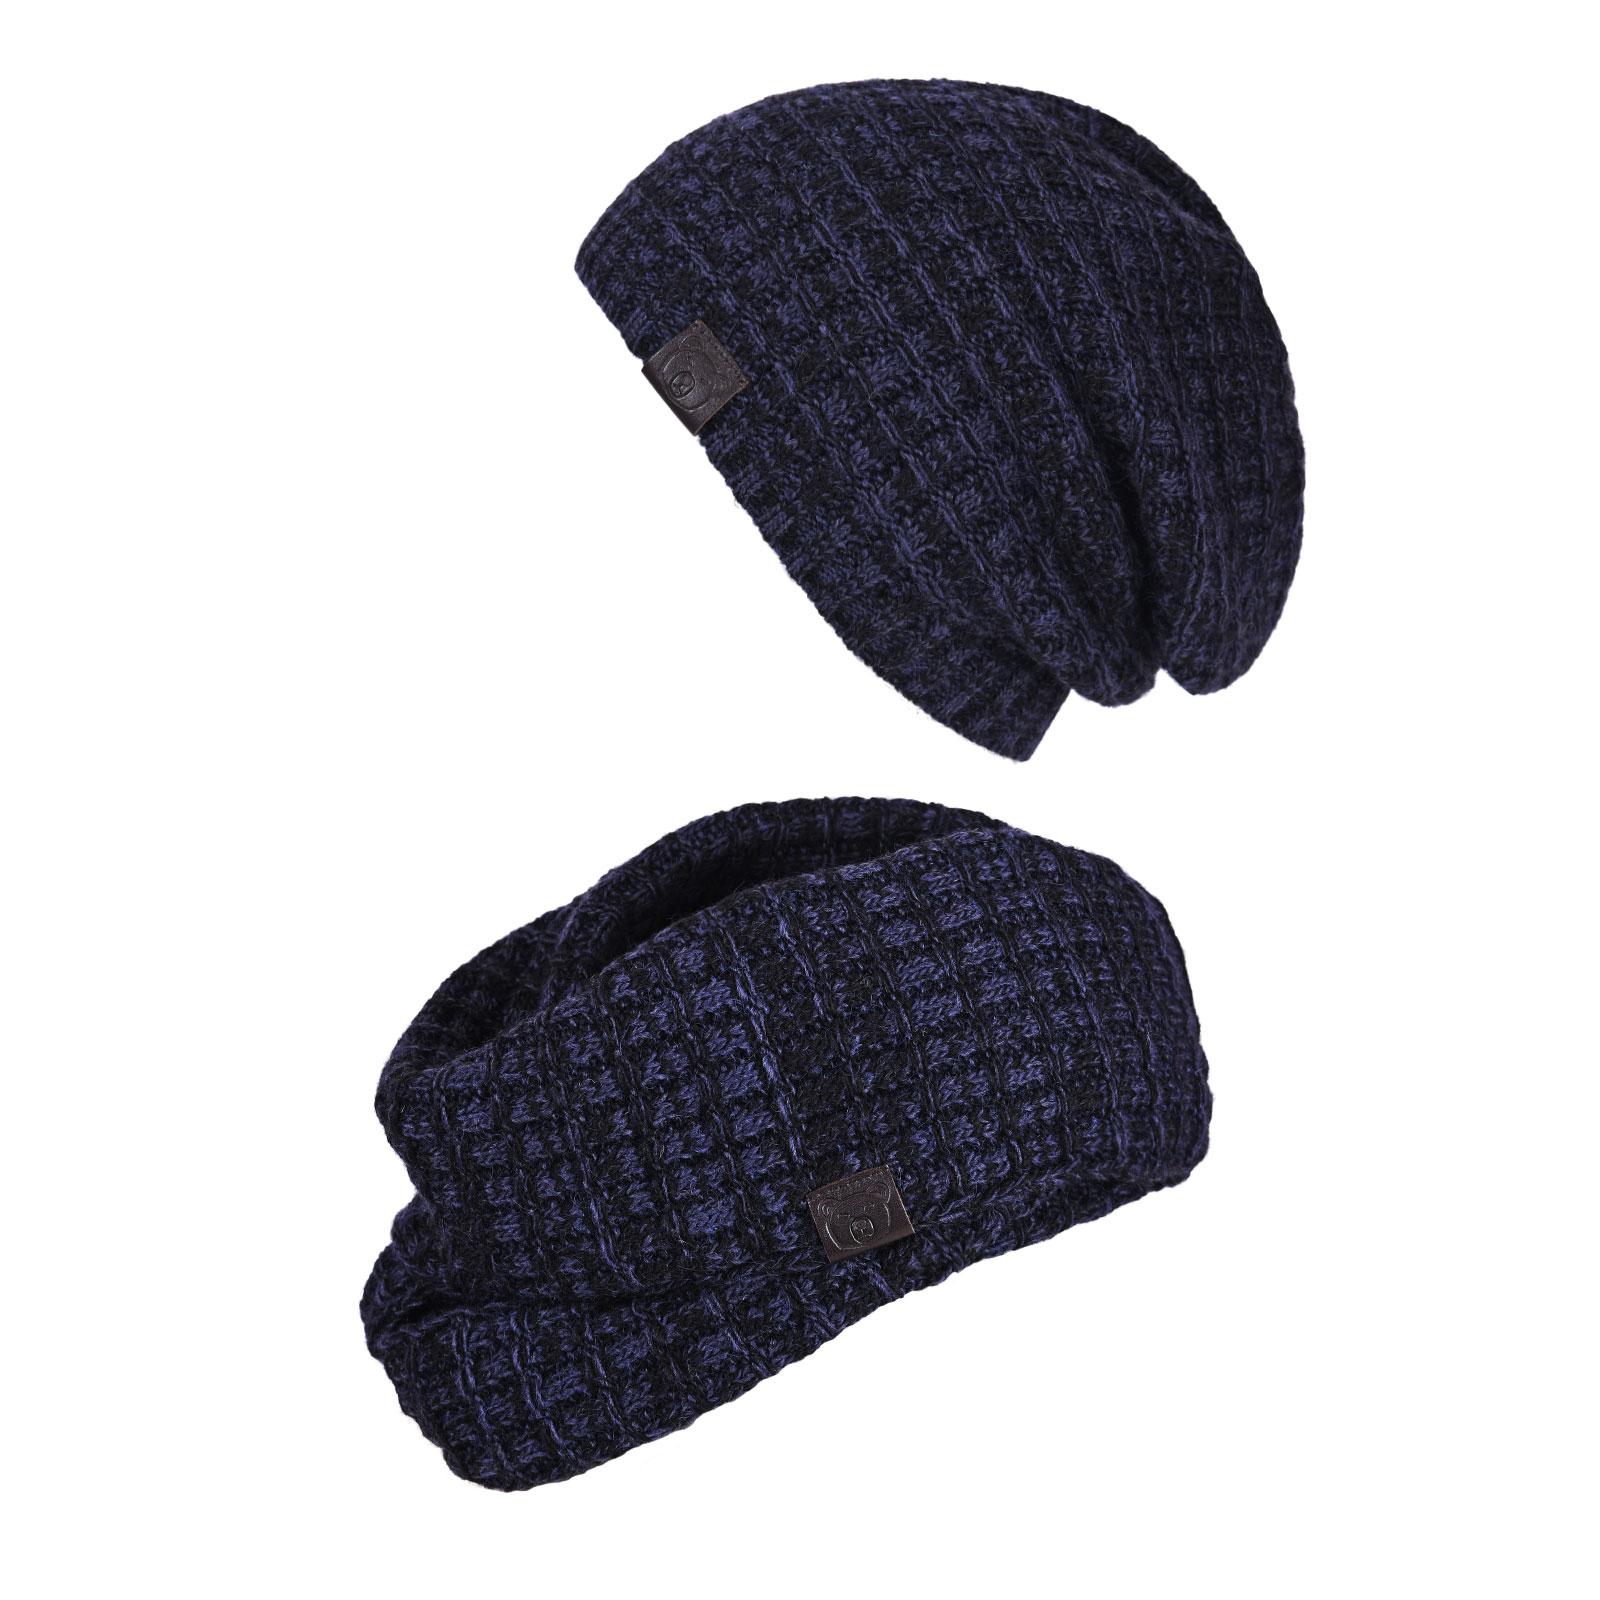 AT-04582-G16-P-ensemble-snood-bonnet-marine